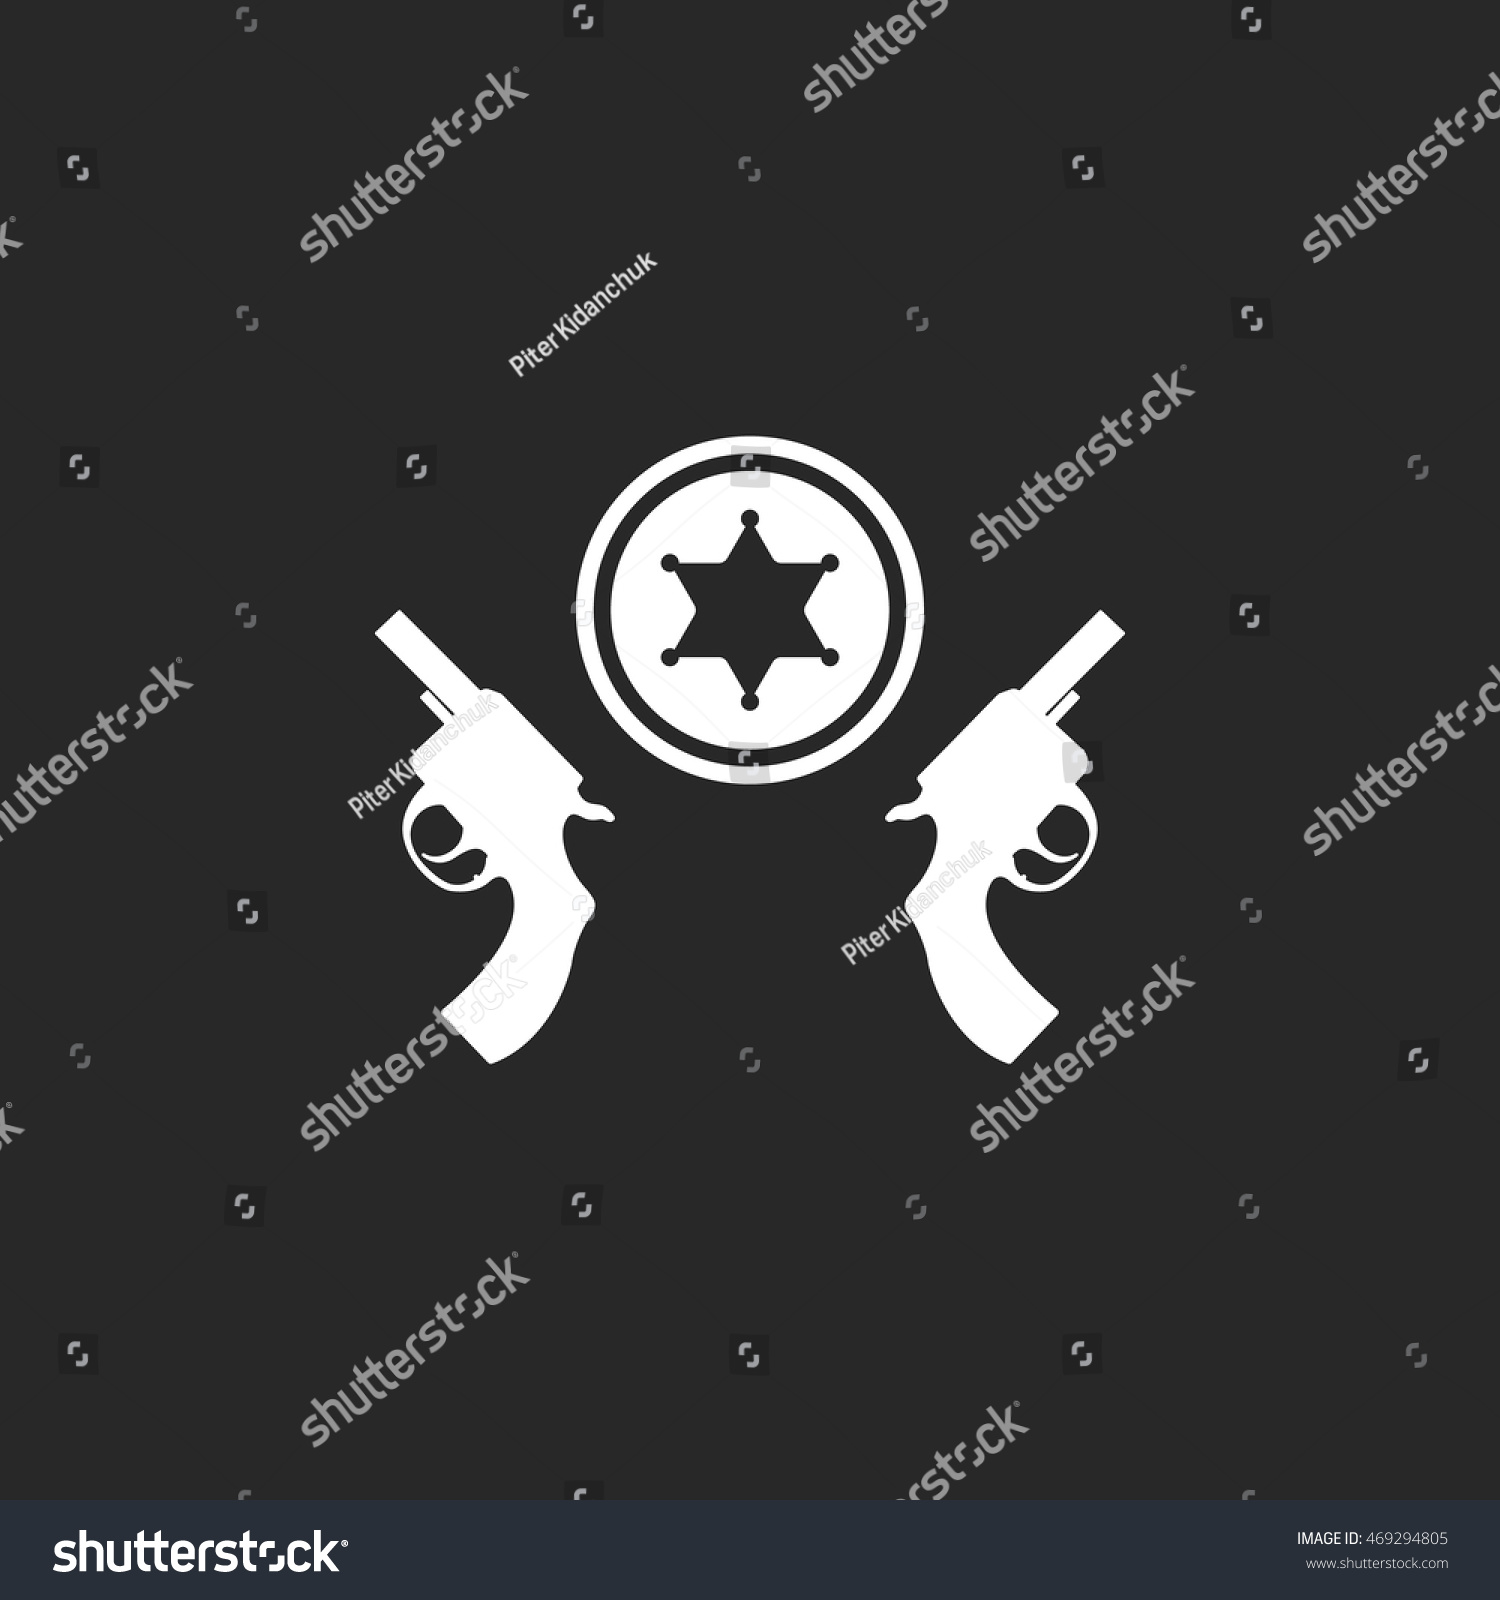 Revolver pistol guns sheriff star symbol stock vector 469294805 revolver pistol guns and sheriff star symbol sign simple icon on background buycottarizona